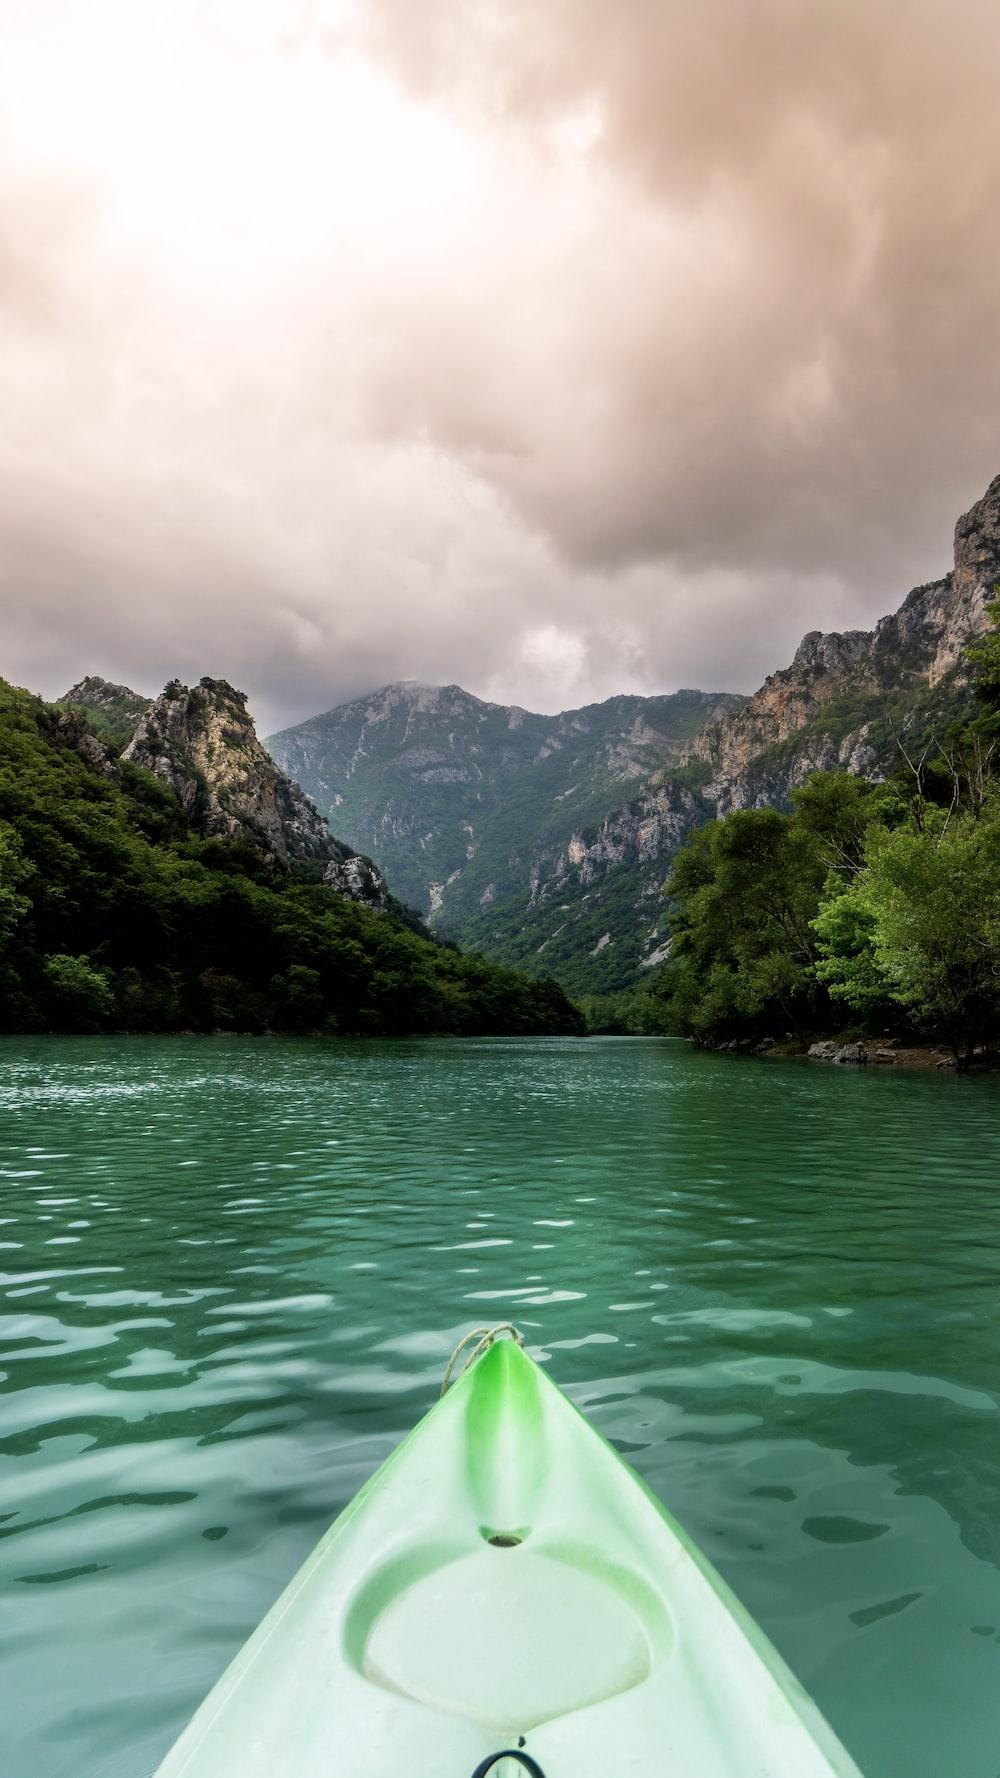 green kayak sailing near grass covered mountains during daytime